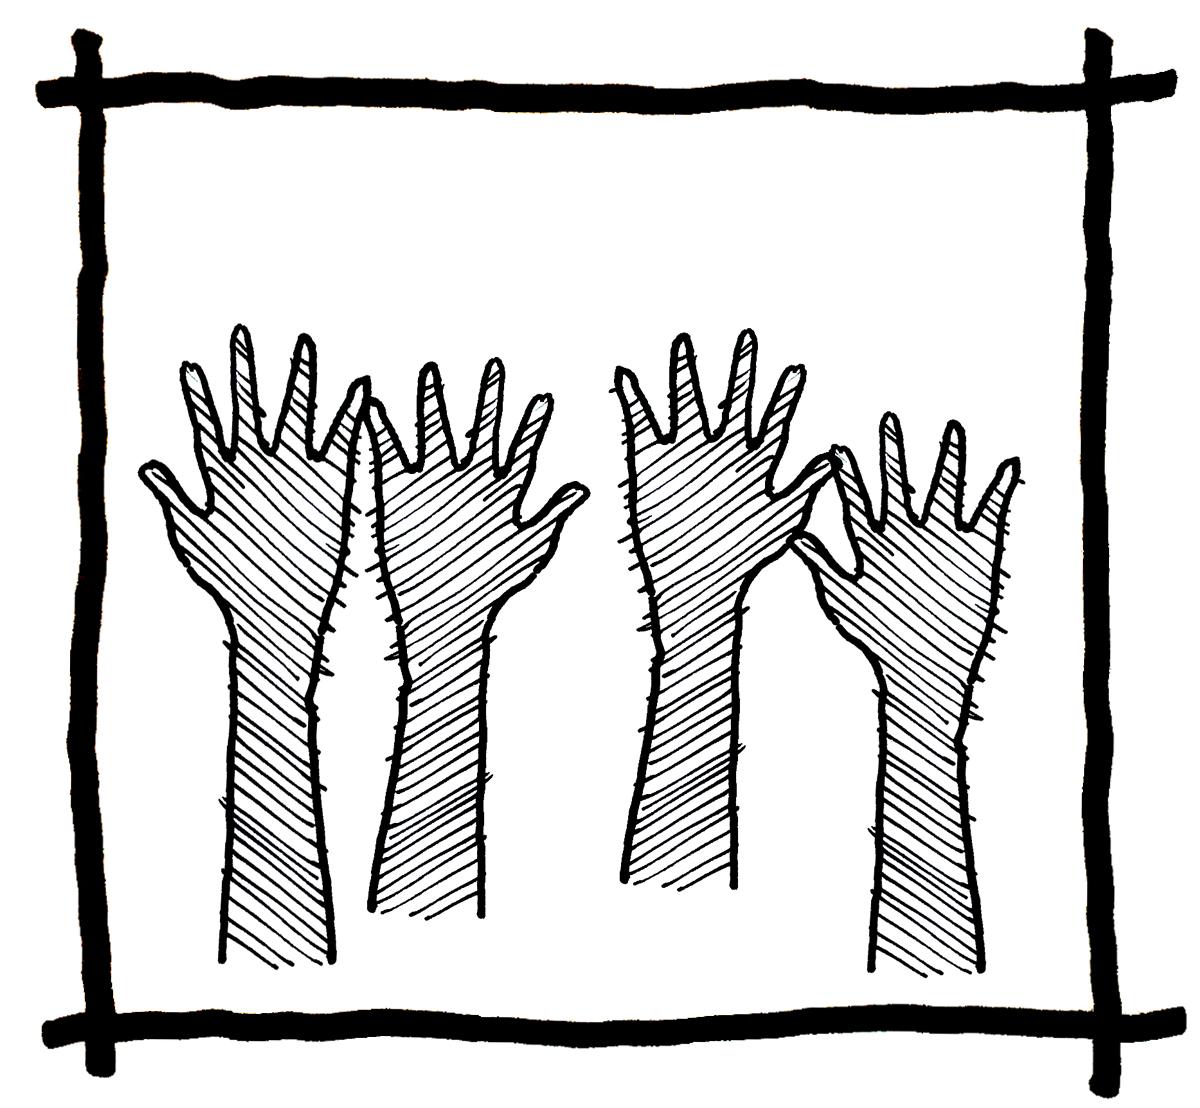 Hand Sketch - Steve Ramos